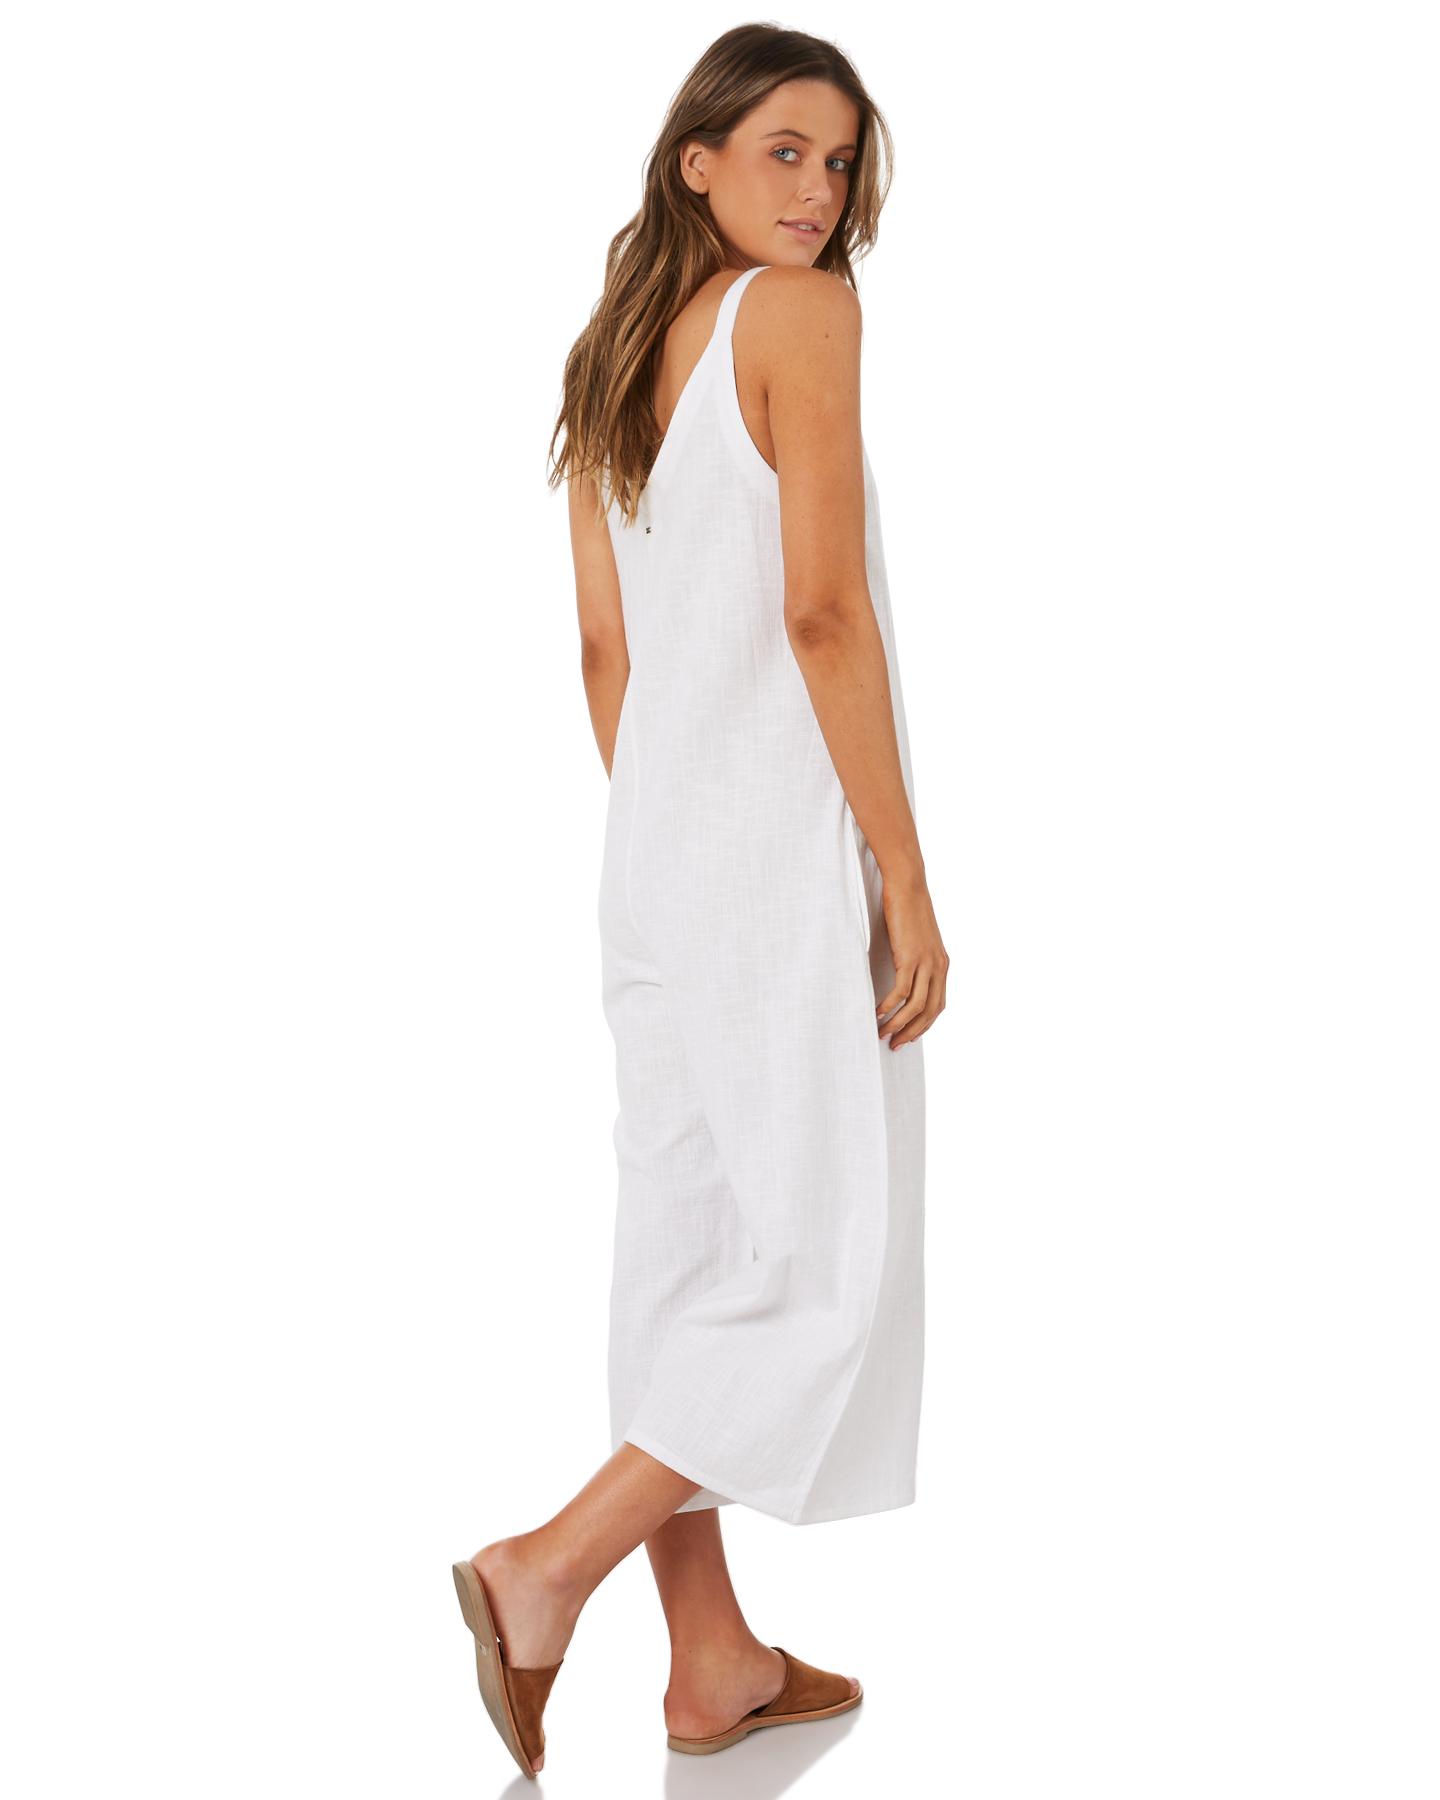 75c8de05f0be New Billabong Women s Wind Chaser Jumpsuit Cotton White